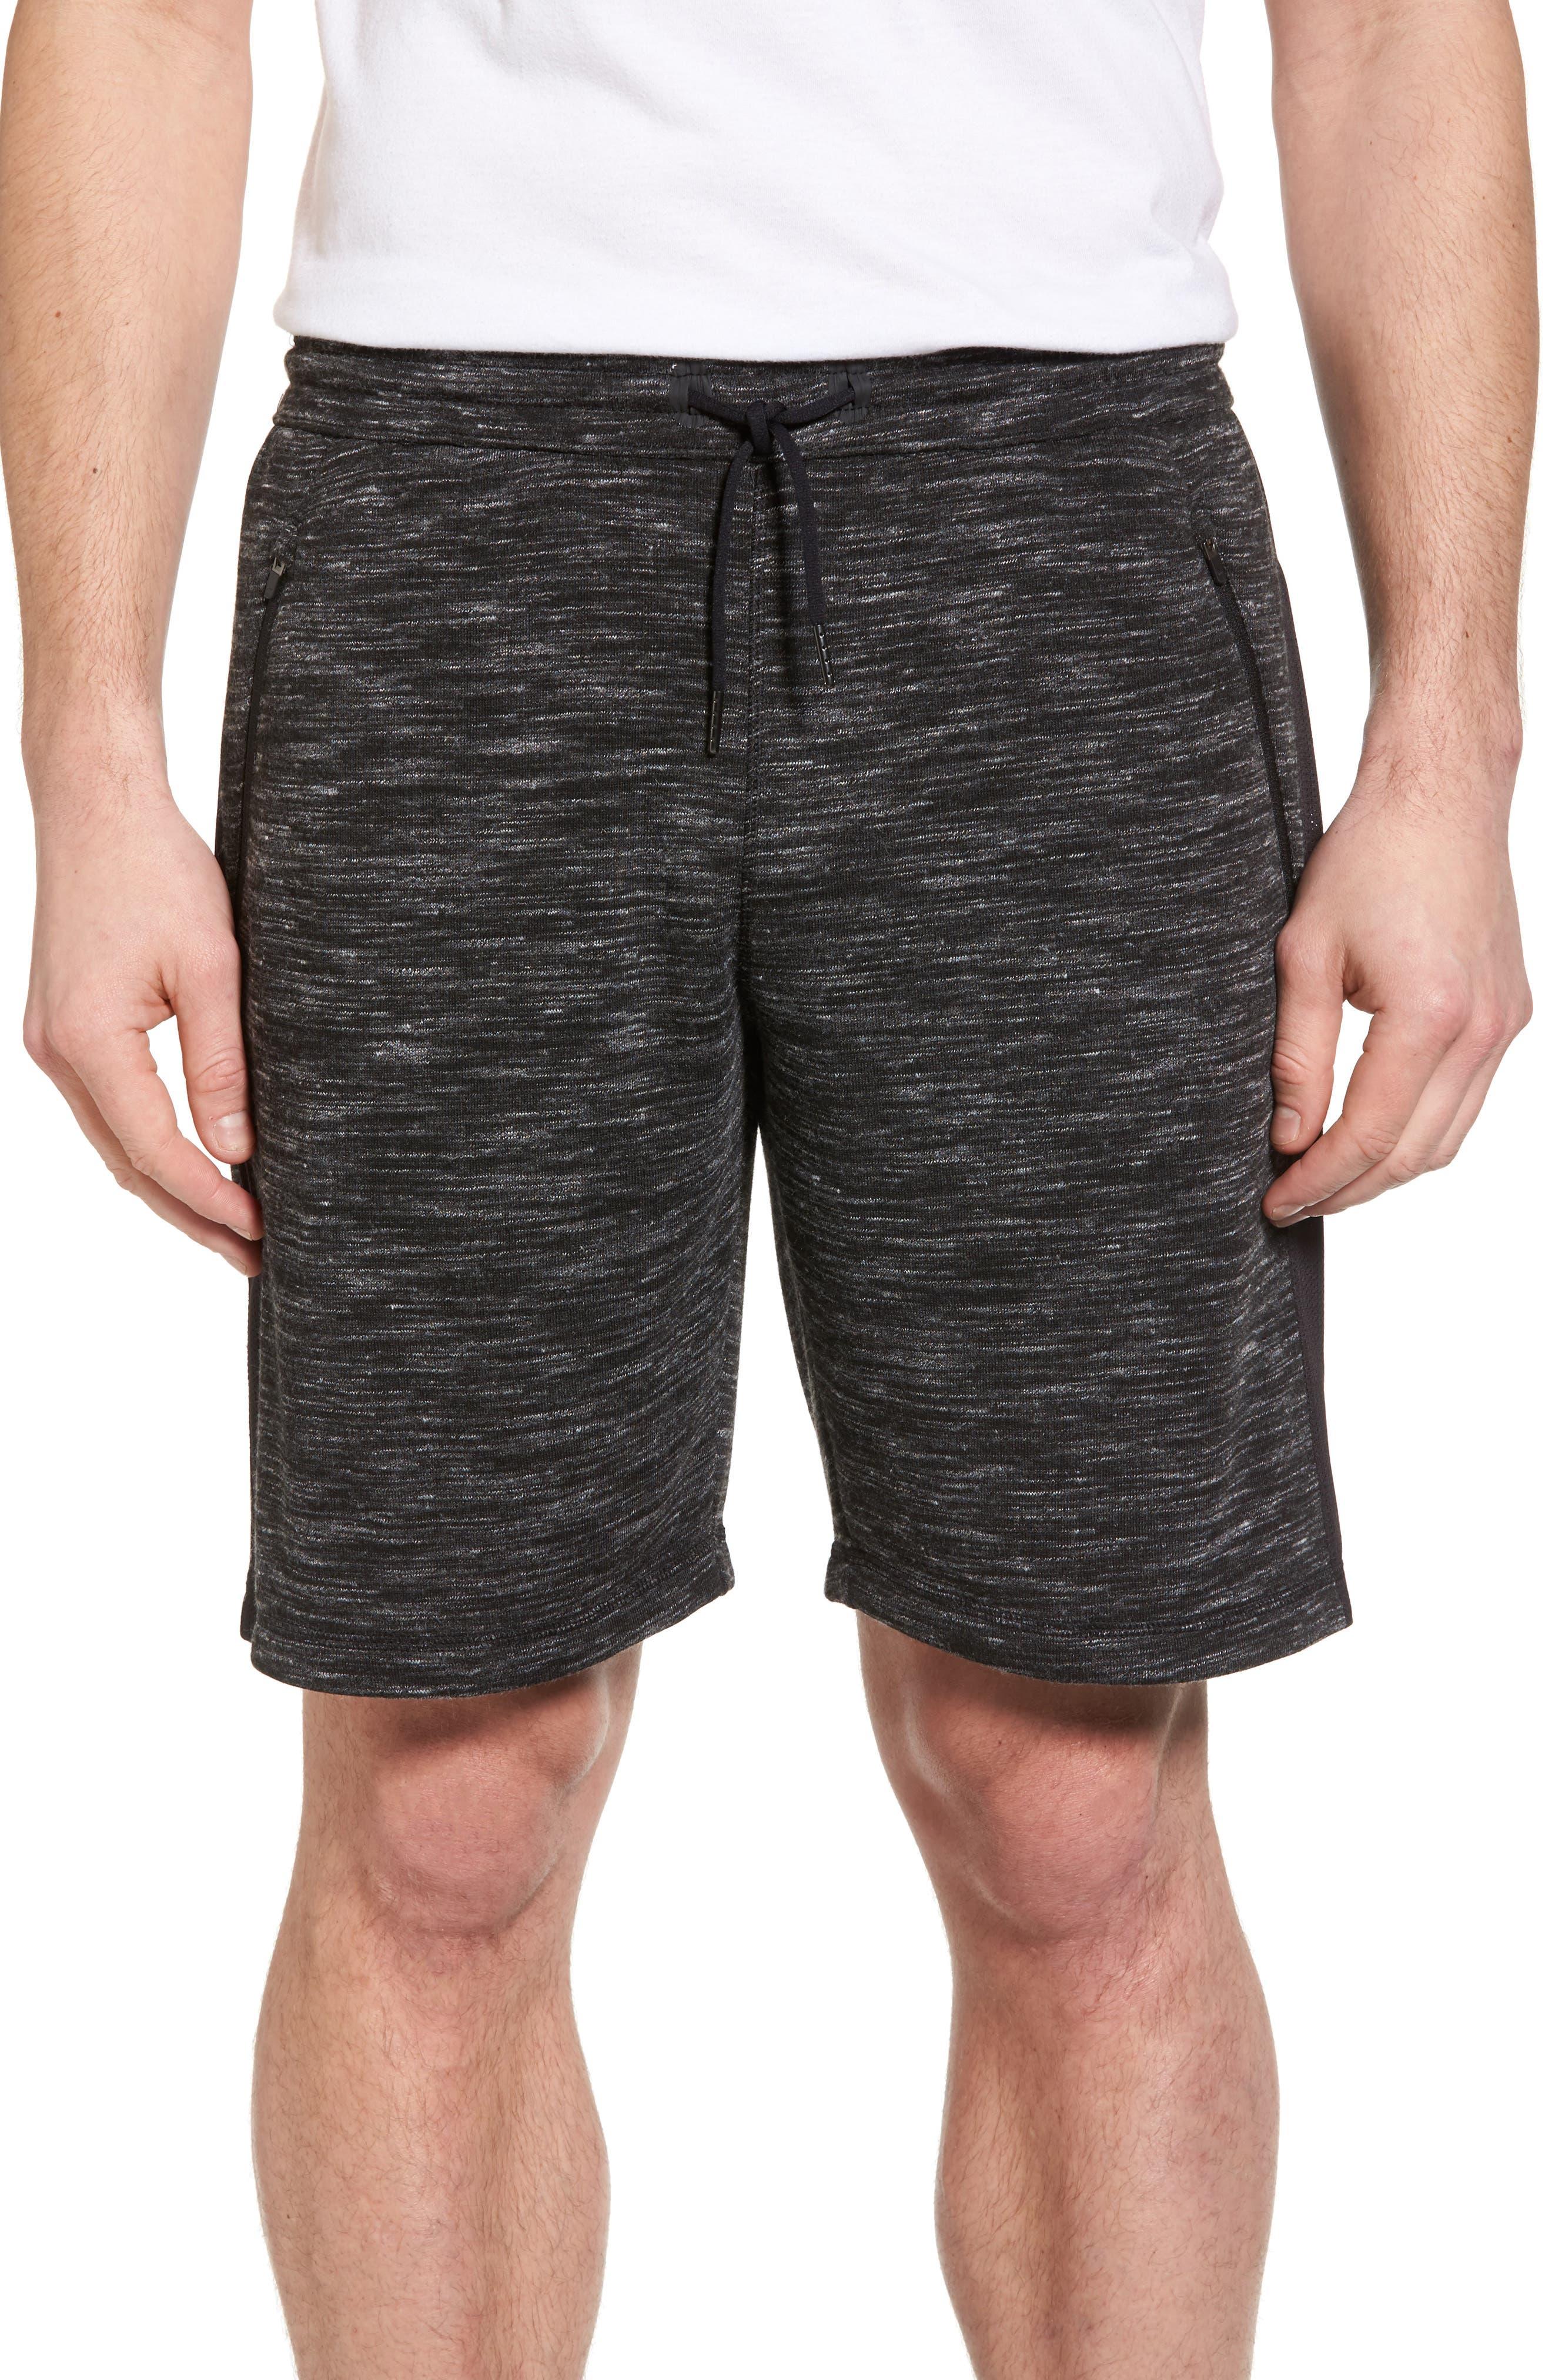 Neptune Terrycloth Shorts,                         Main,                         color, Black Oxide Melange